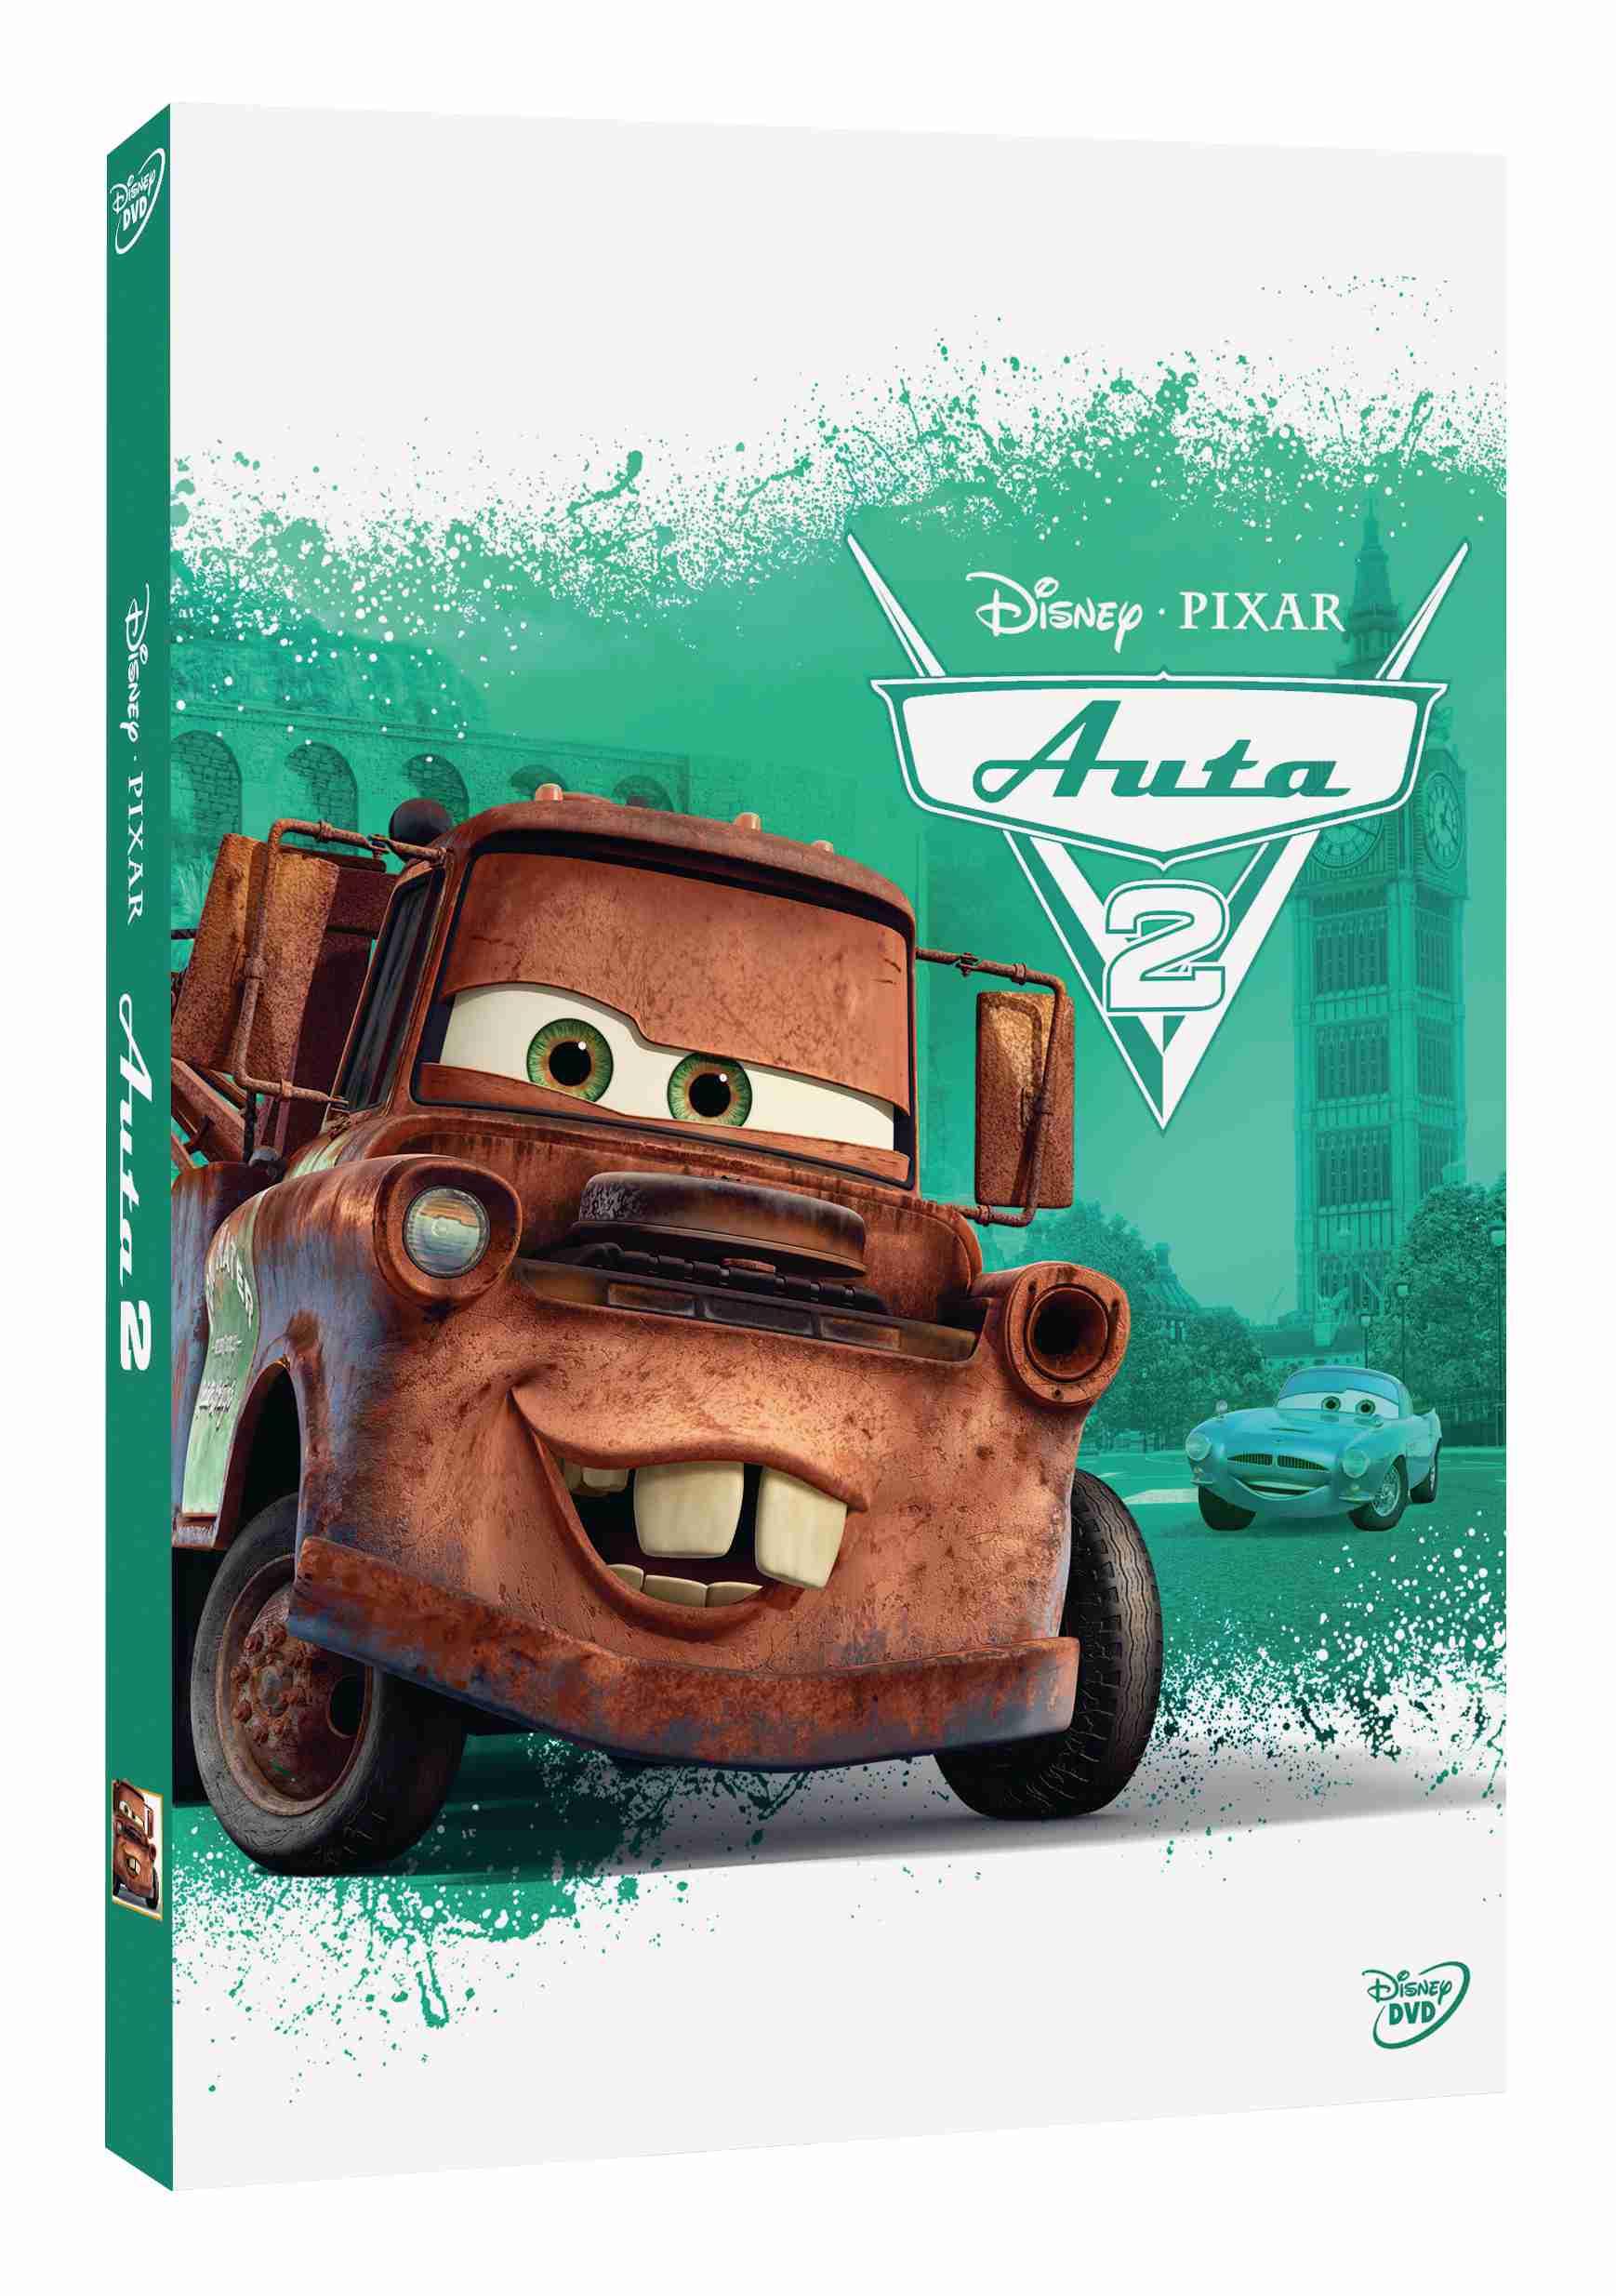 AUTA 2 (Cars 2) - DVD